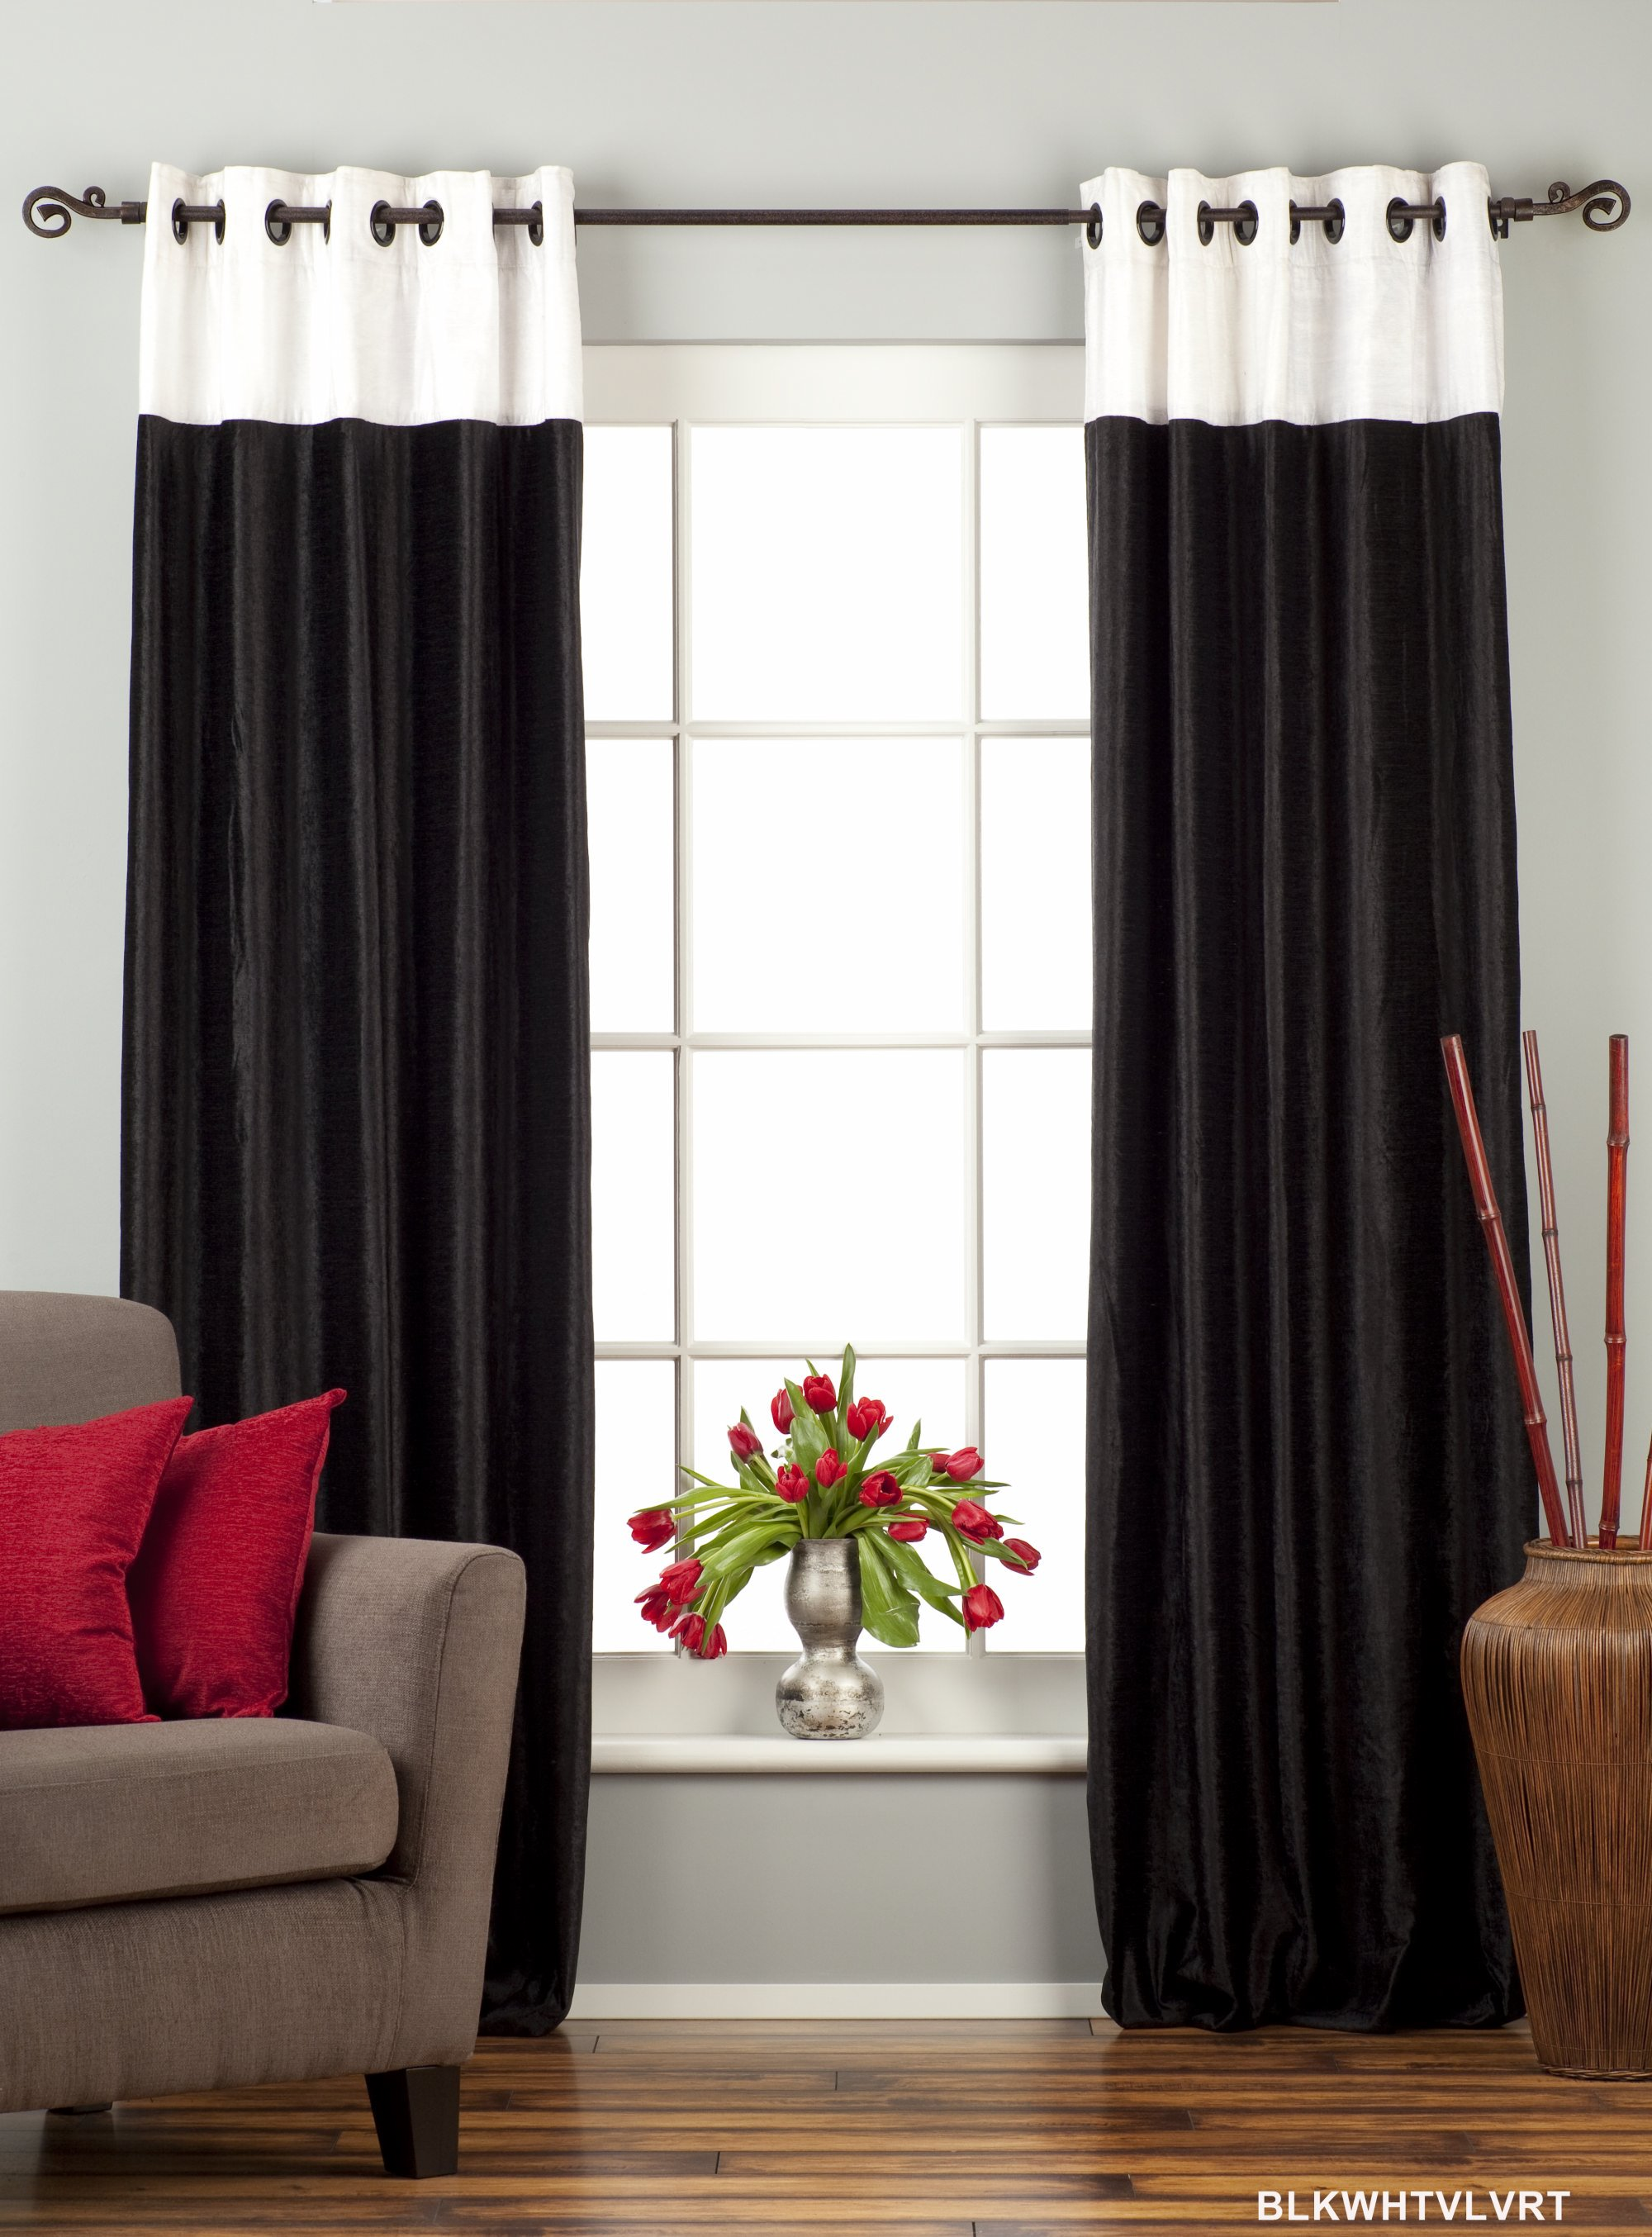 curtains curtain velvet panel designer drapery curtins drapes panels piece signature grommet dark ring modern google biz